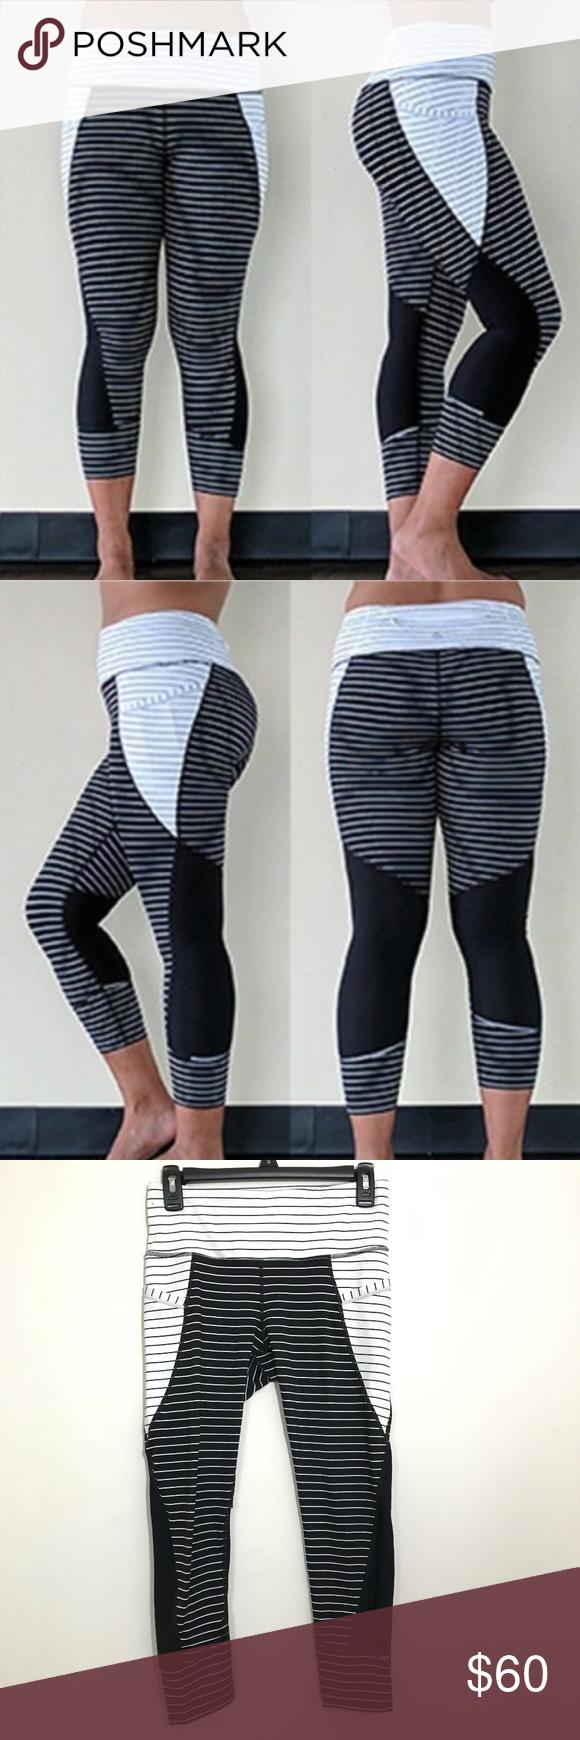 15e09cc9614a9 NWOT Athleta Black/White Relay Stripe Leggings - Recycled Polyester/Lycra®  Spandex -